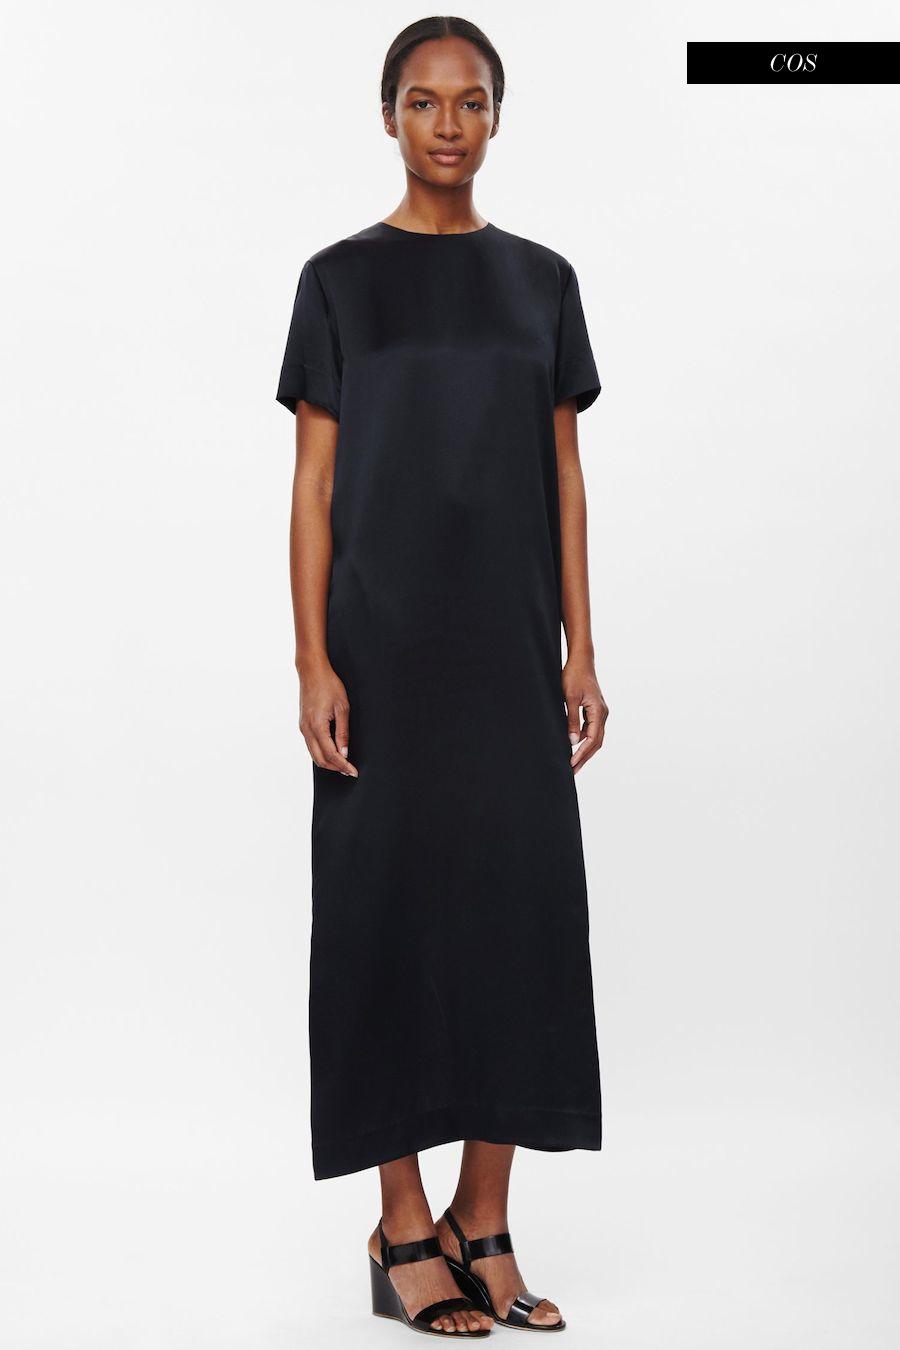 Maxi dress under 200 fash-n-chips.com 10